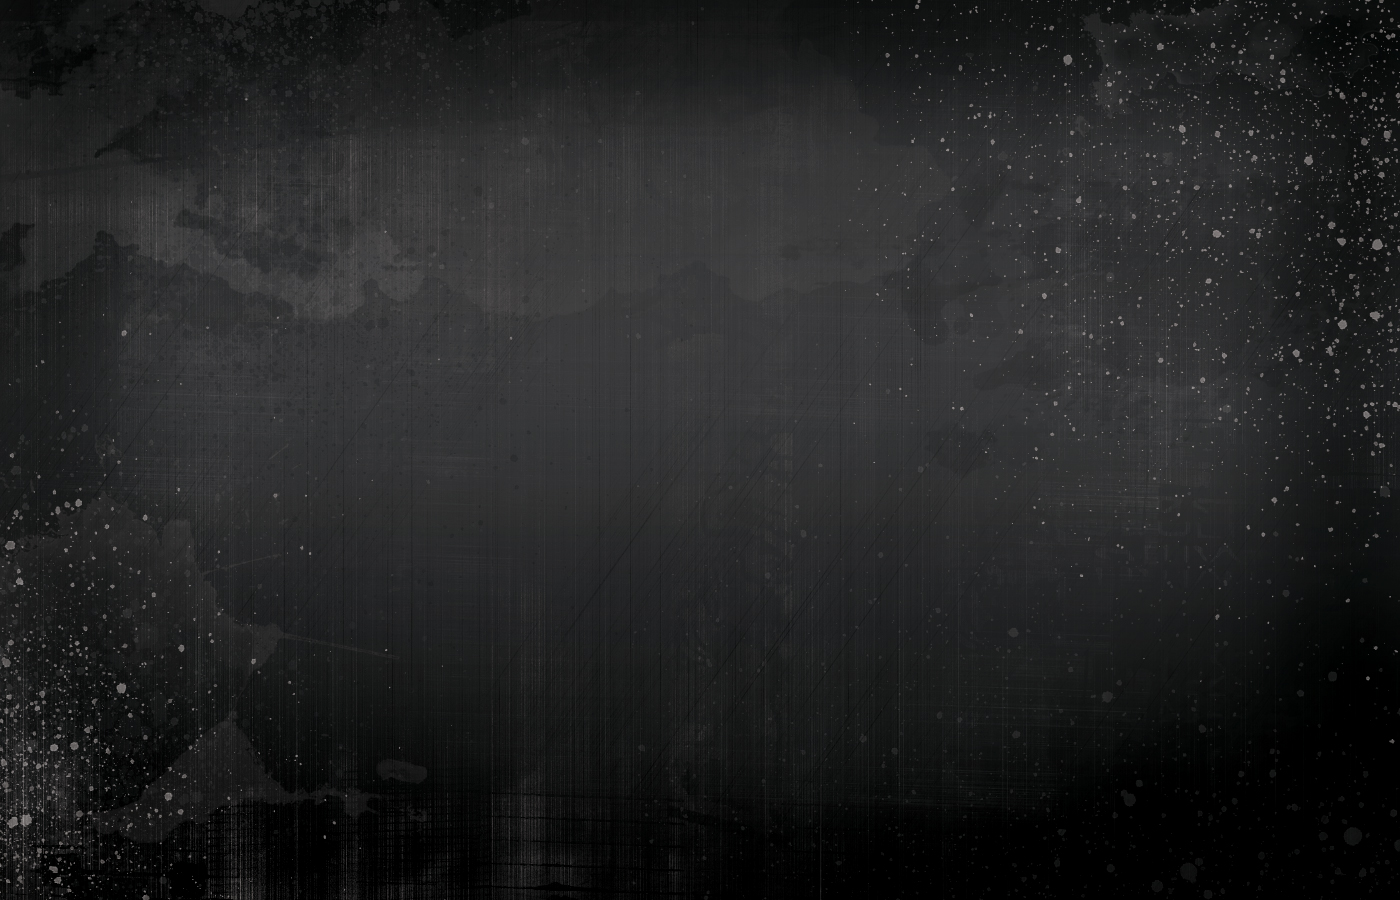 Speckled_Background